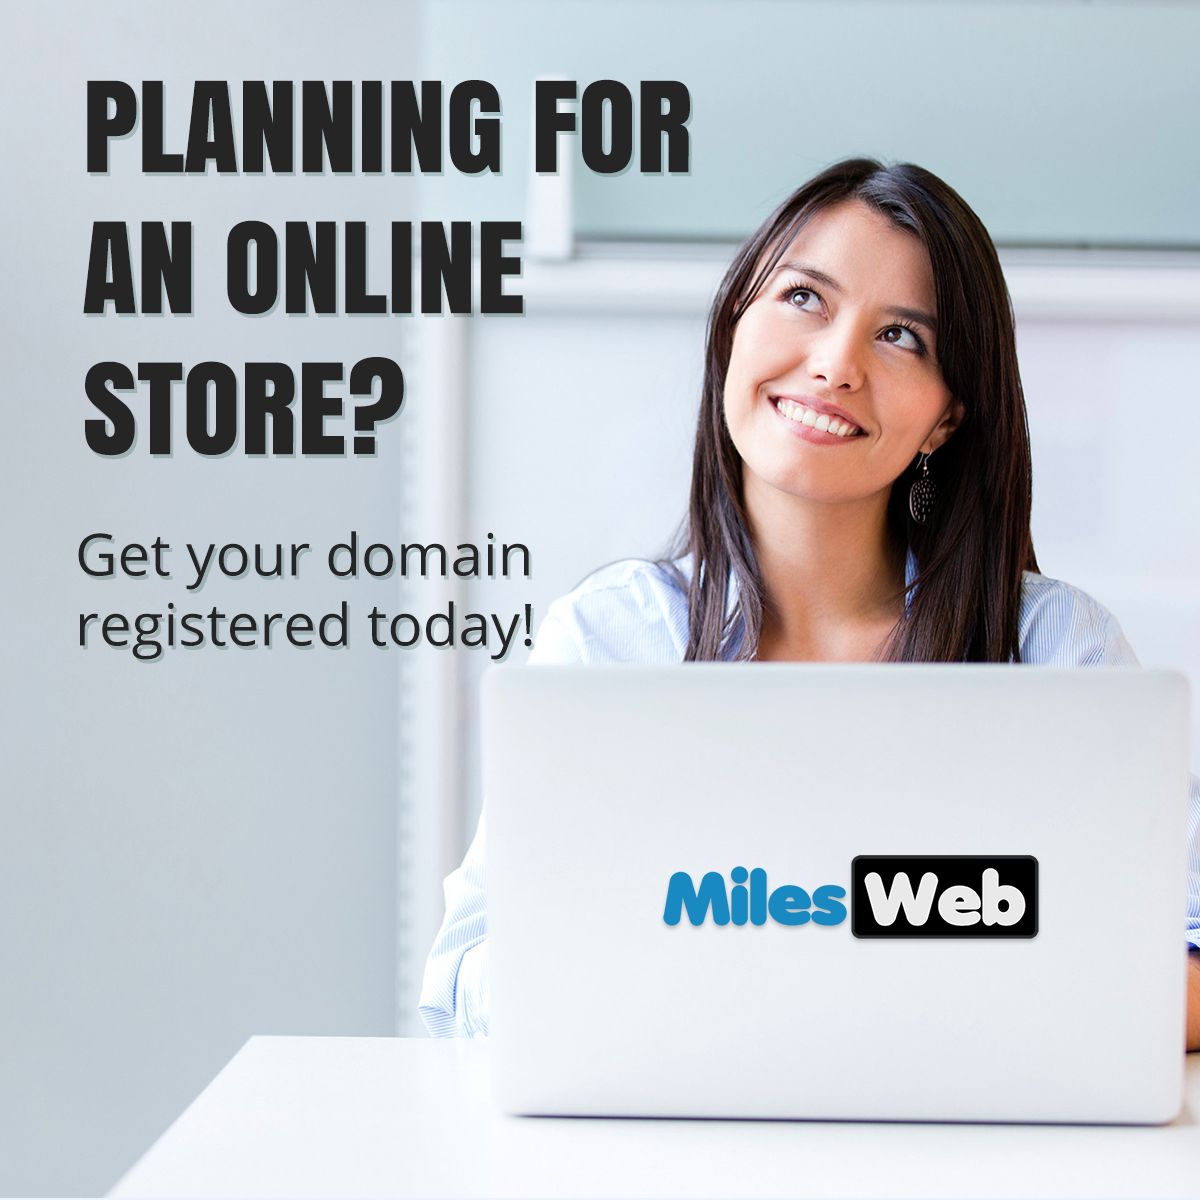 Domain Names Register Transfer Blog Hosting Blog Hosting Sites Web Hosting